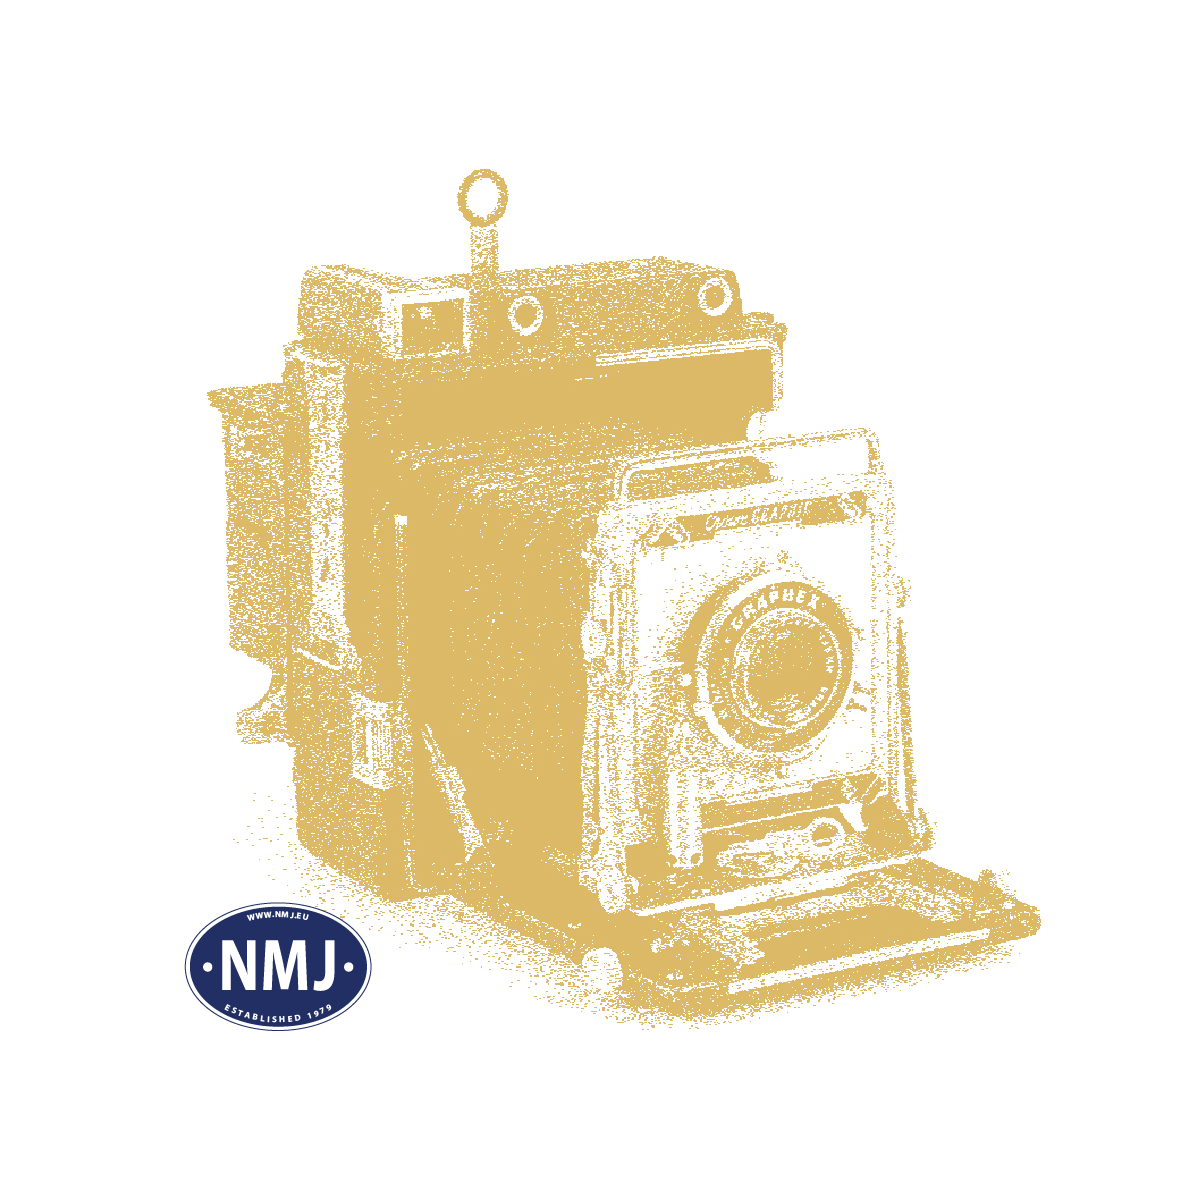 NMJT106.506 - NMJ Topline Personenwagen AB3.25675 der NSB, rot/grau/silber